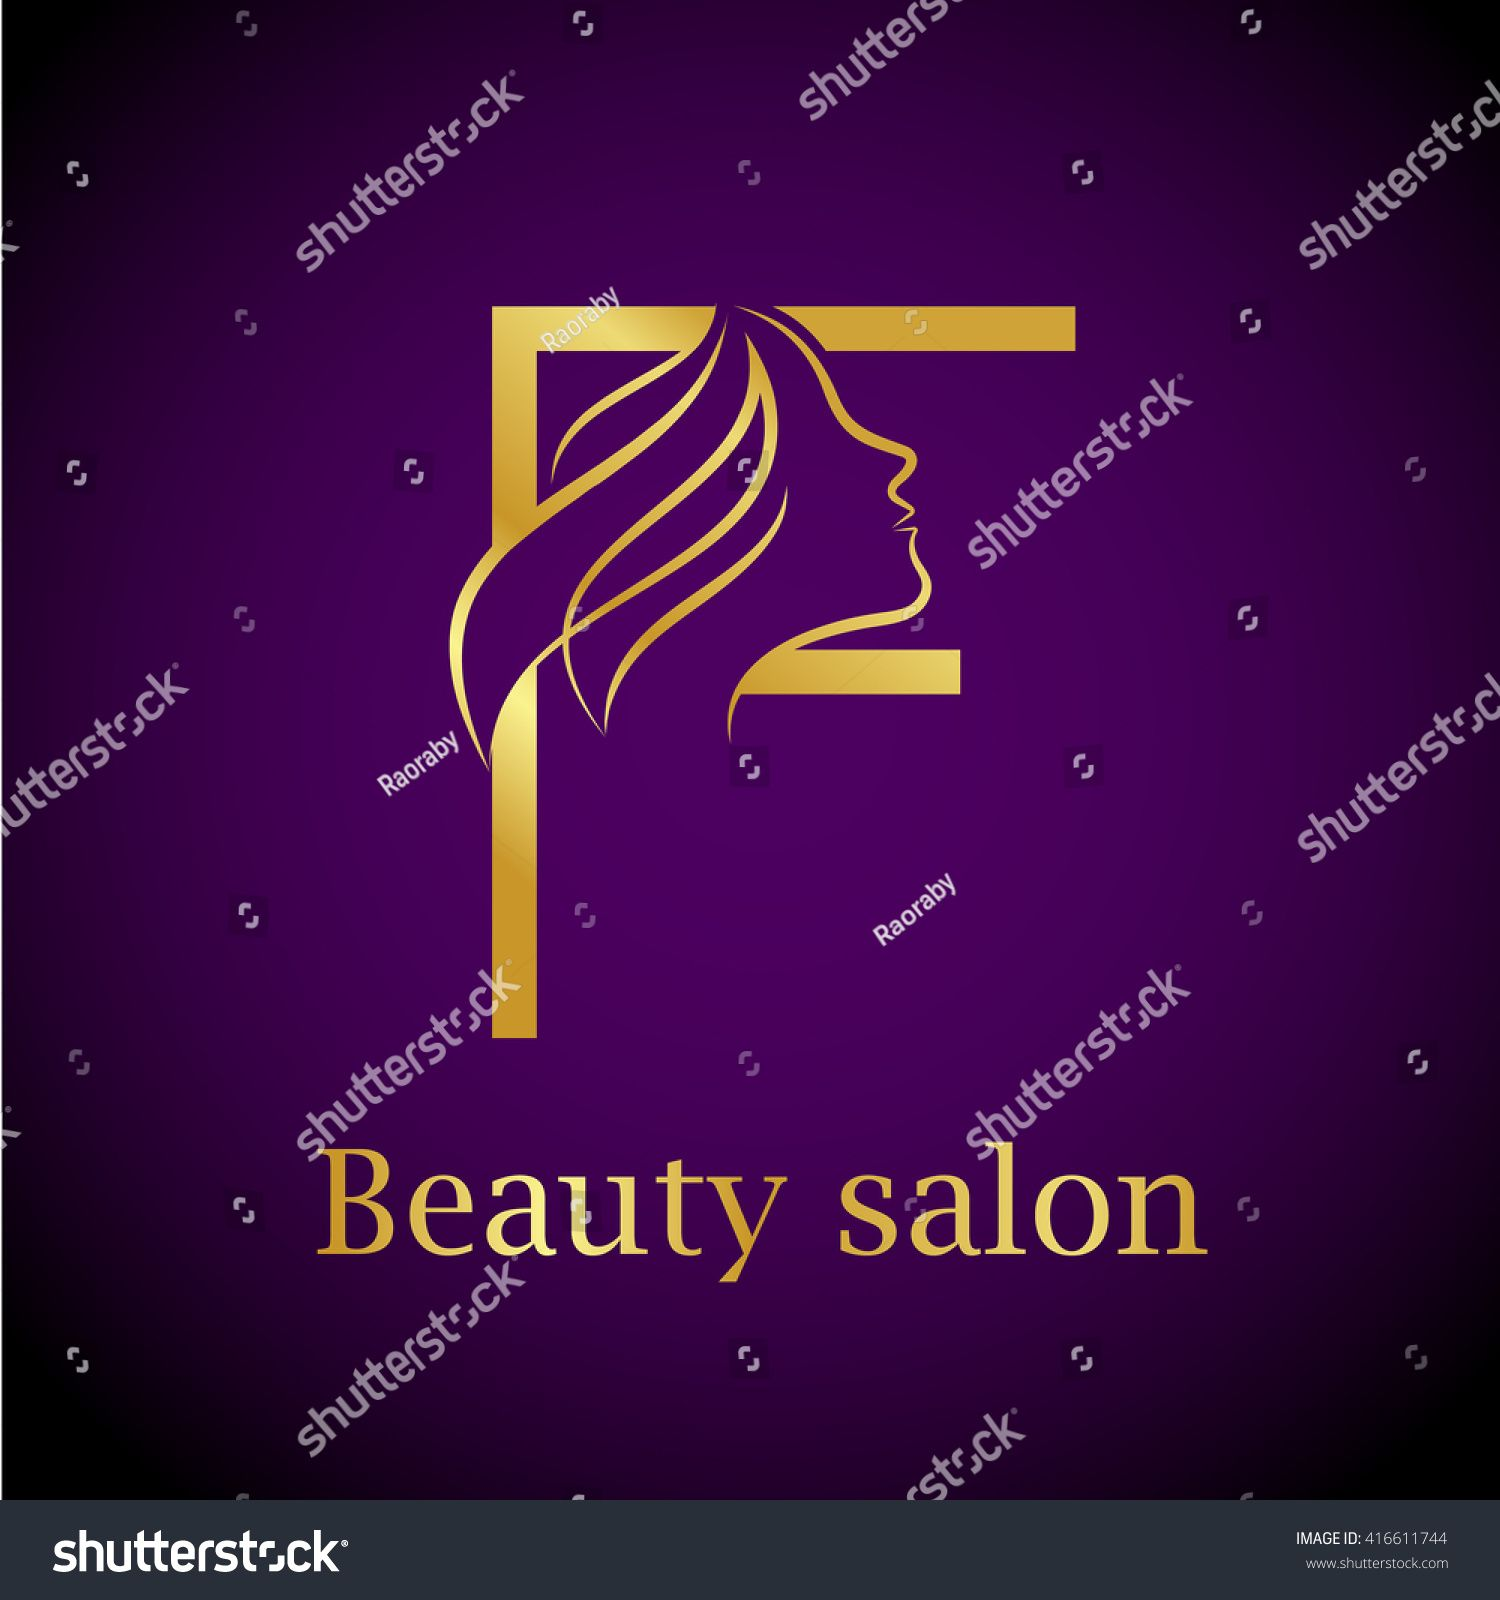 Abstract letter F logo,Gold Beauty salon logo design template   fs ...